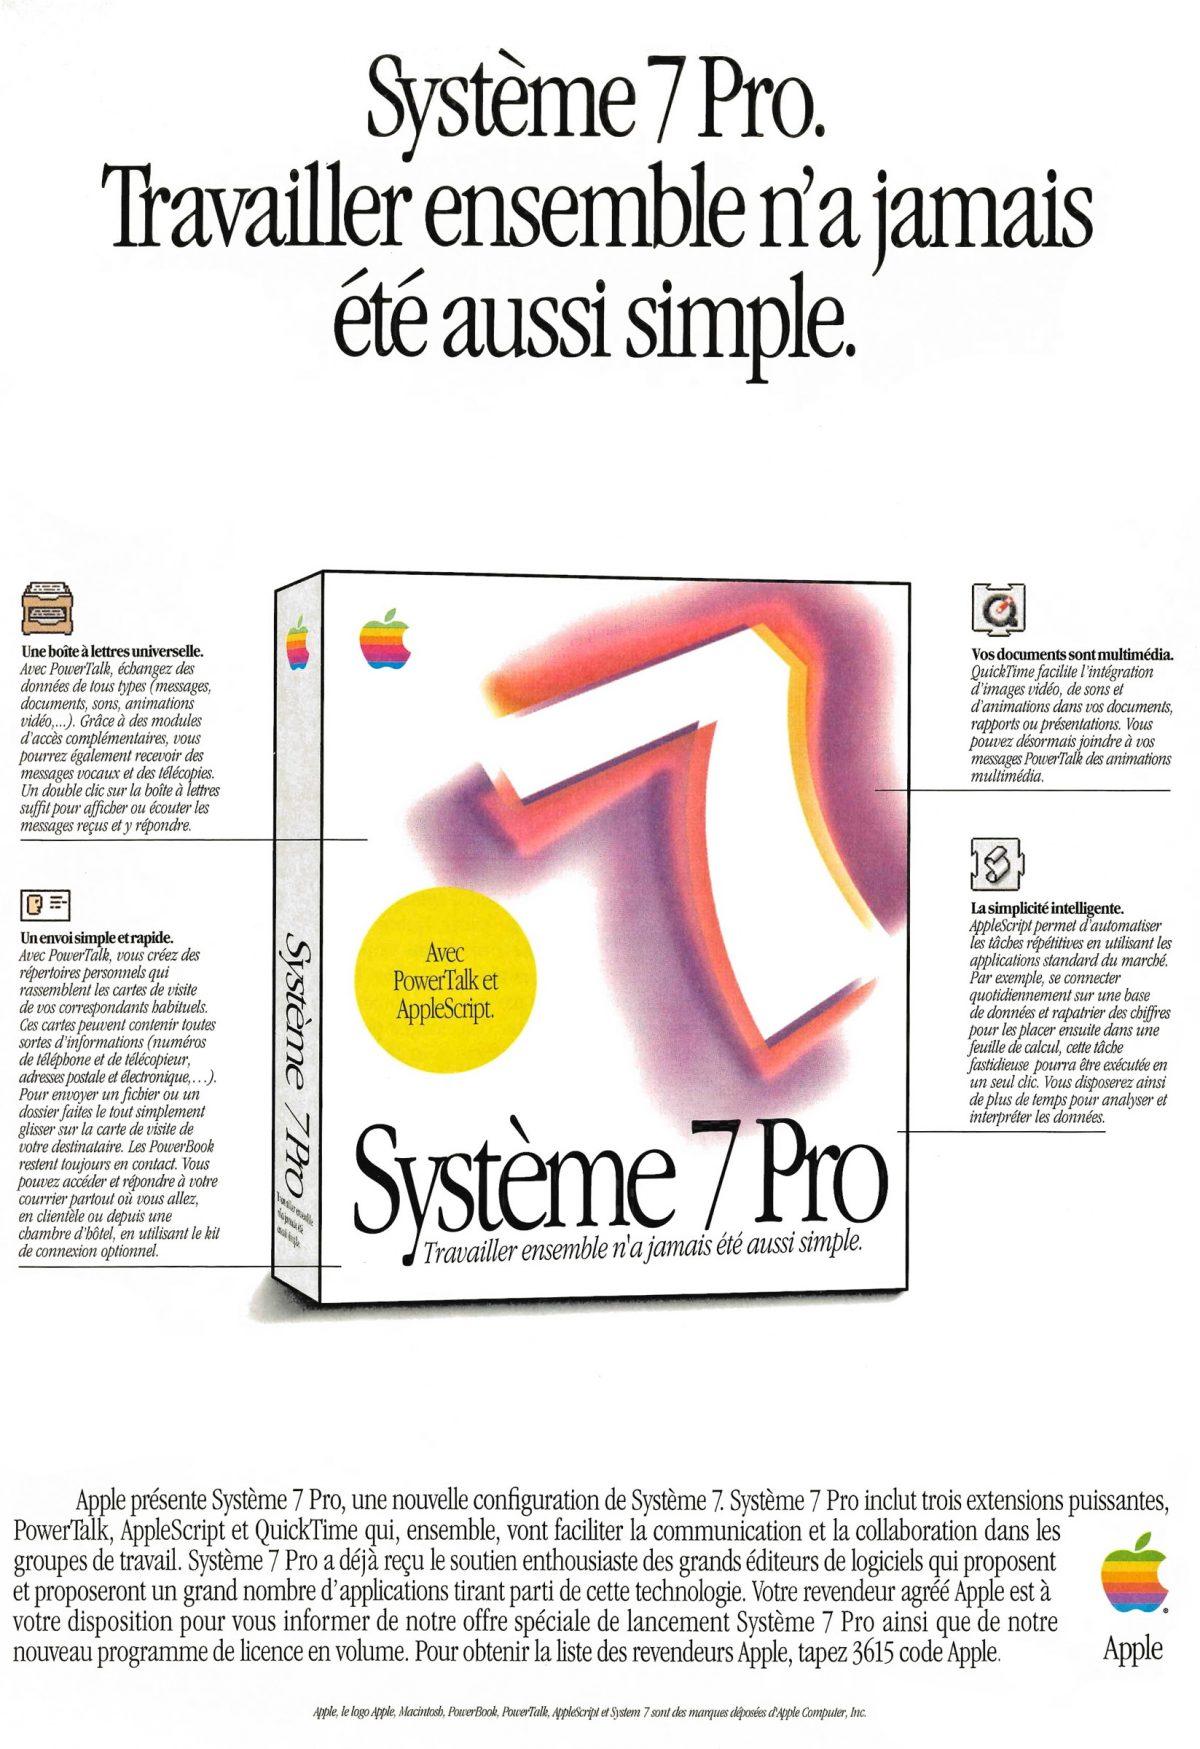 Apple System 7 Pro ad